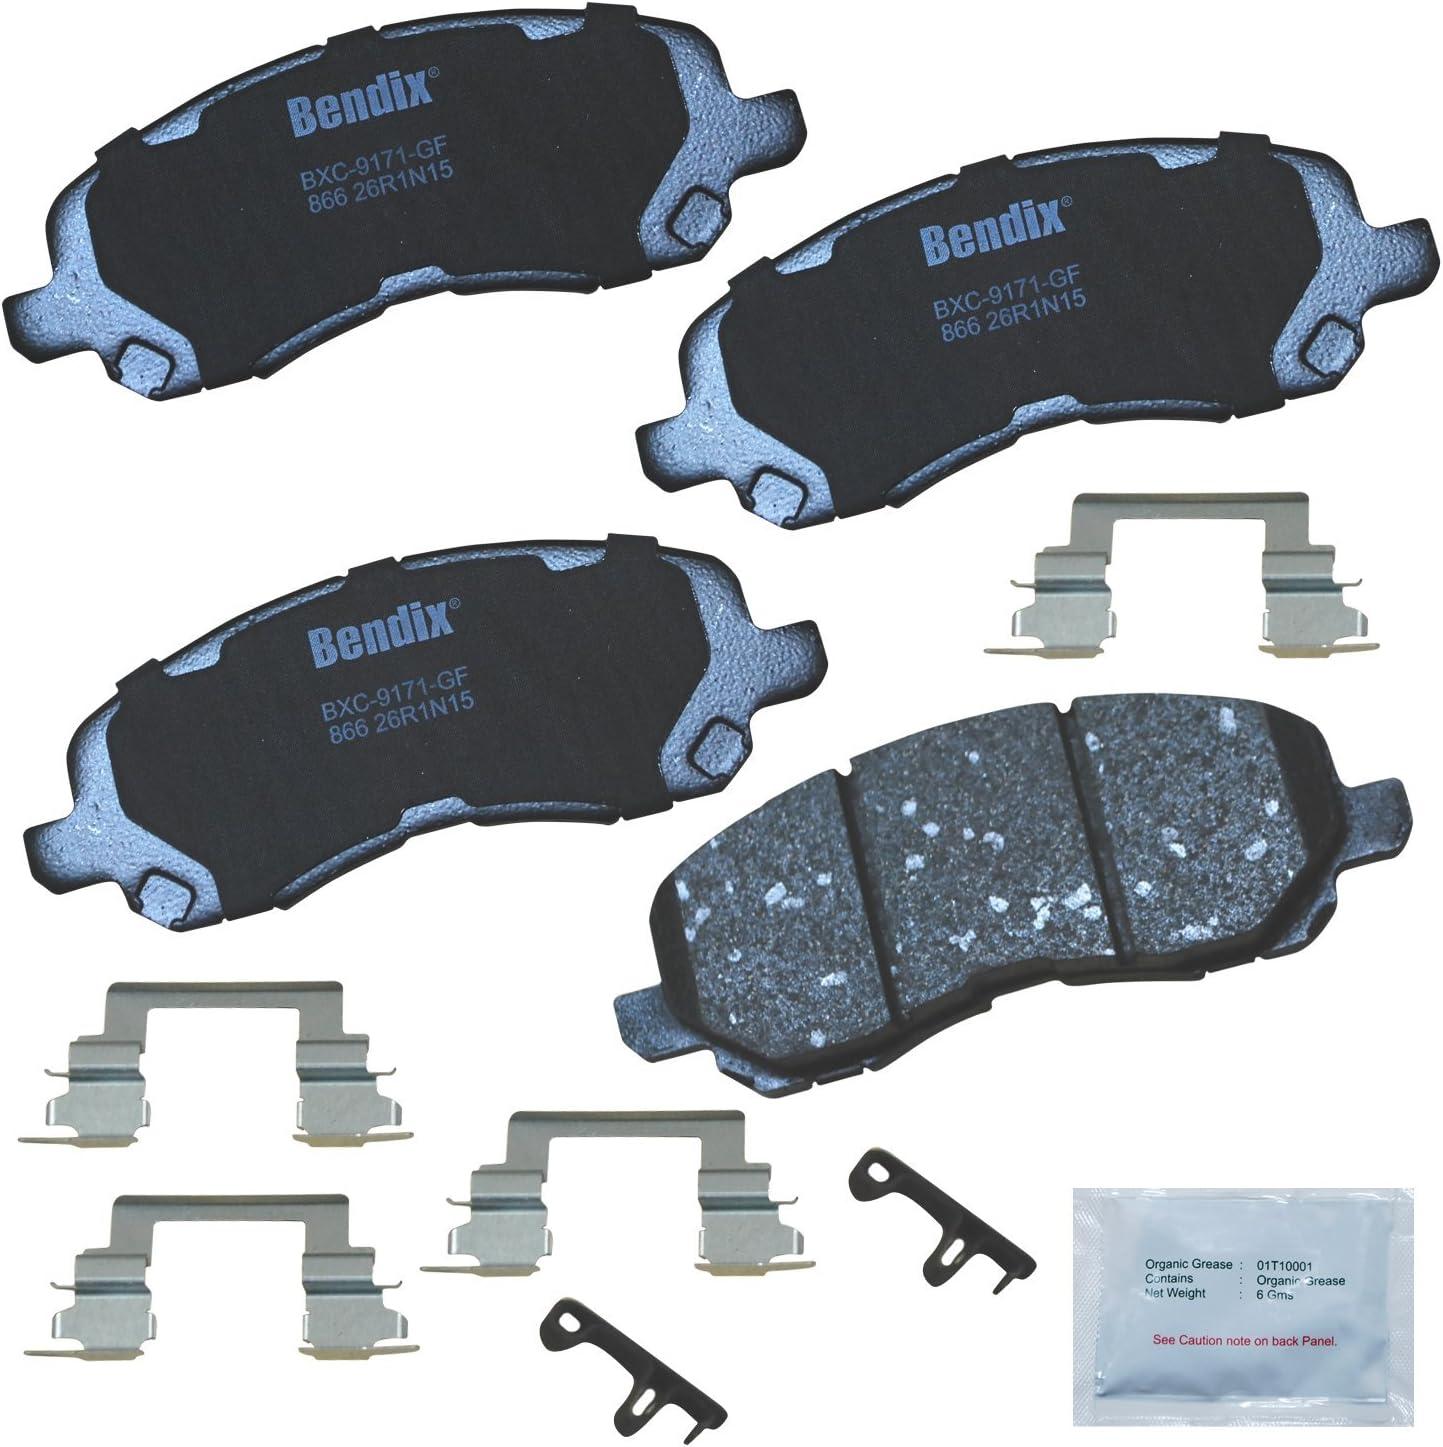 Bendix Premium Copper Free CFC866 Ceramic Brake Pad (with Installation Hardware Front)